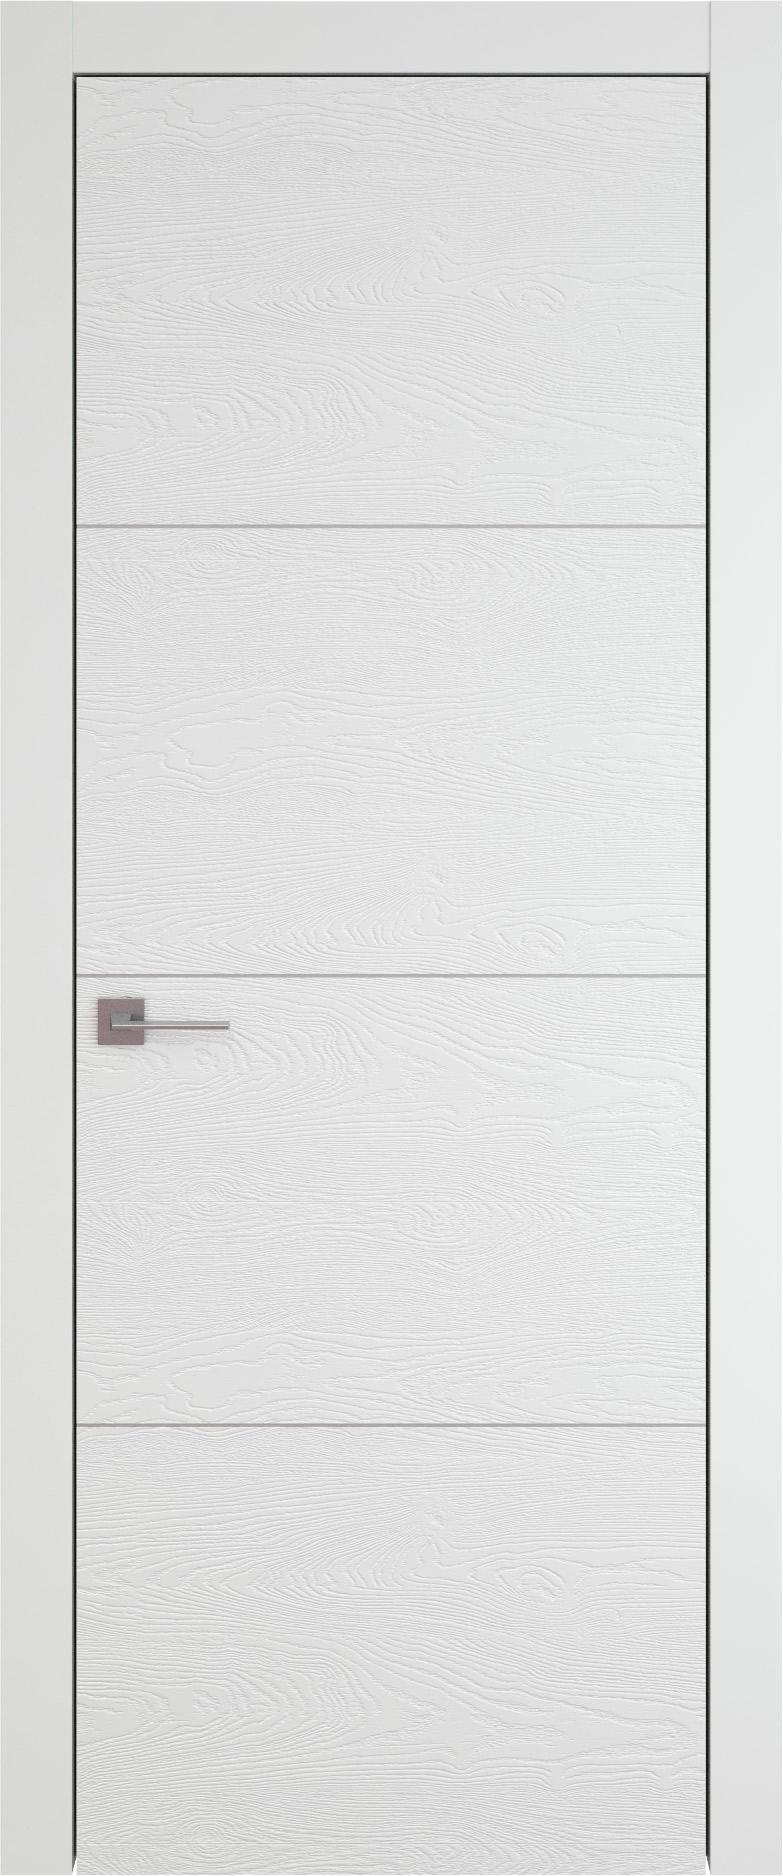 Tivoli Г-3 цвет - Белая эмаль по шпону (RAL 9003) Без стекла (ДГ)